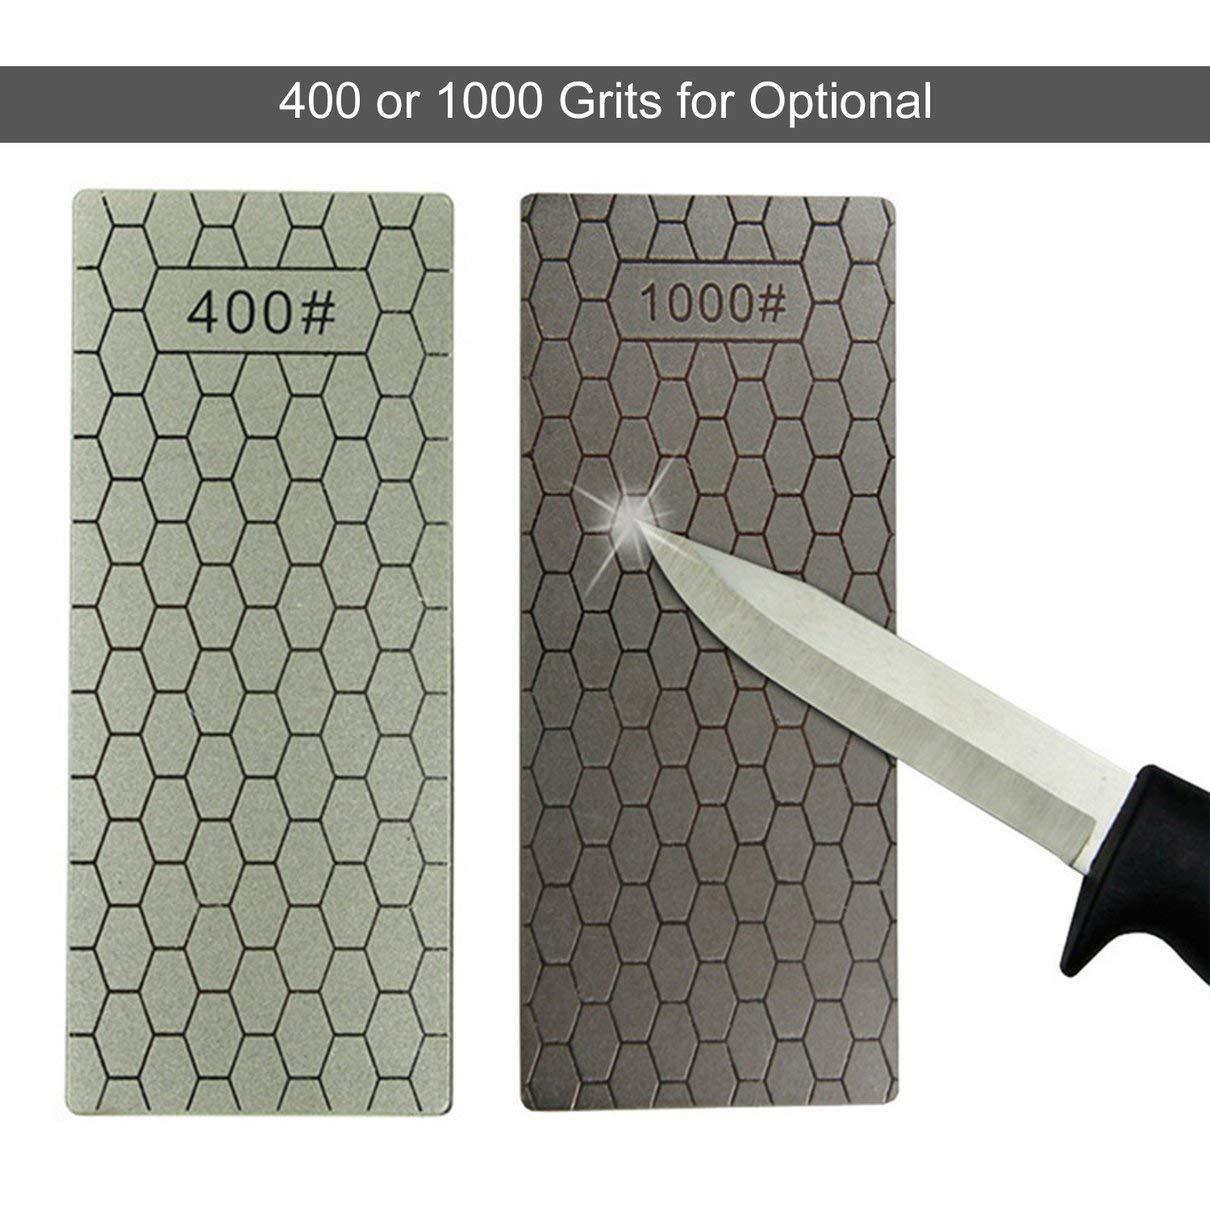 gris Togames 400//1000 Granos Cuchillos de piedra de afilado de diamantes finos Placa de diamante Afilador de cuchillos de piedra de afilar Afilador Herramientas de afilar